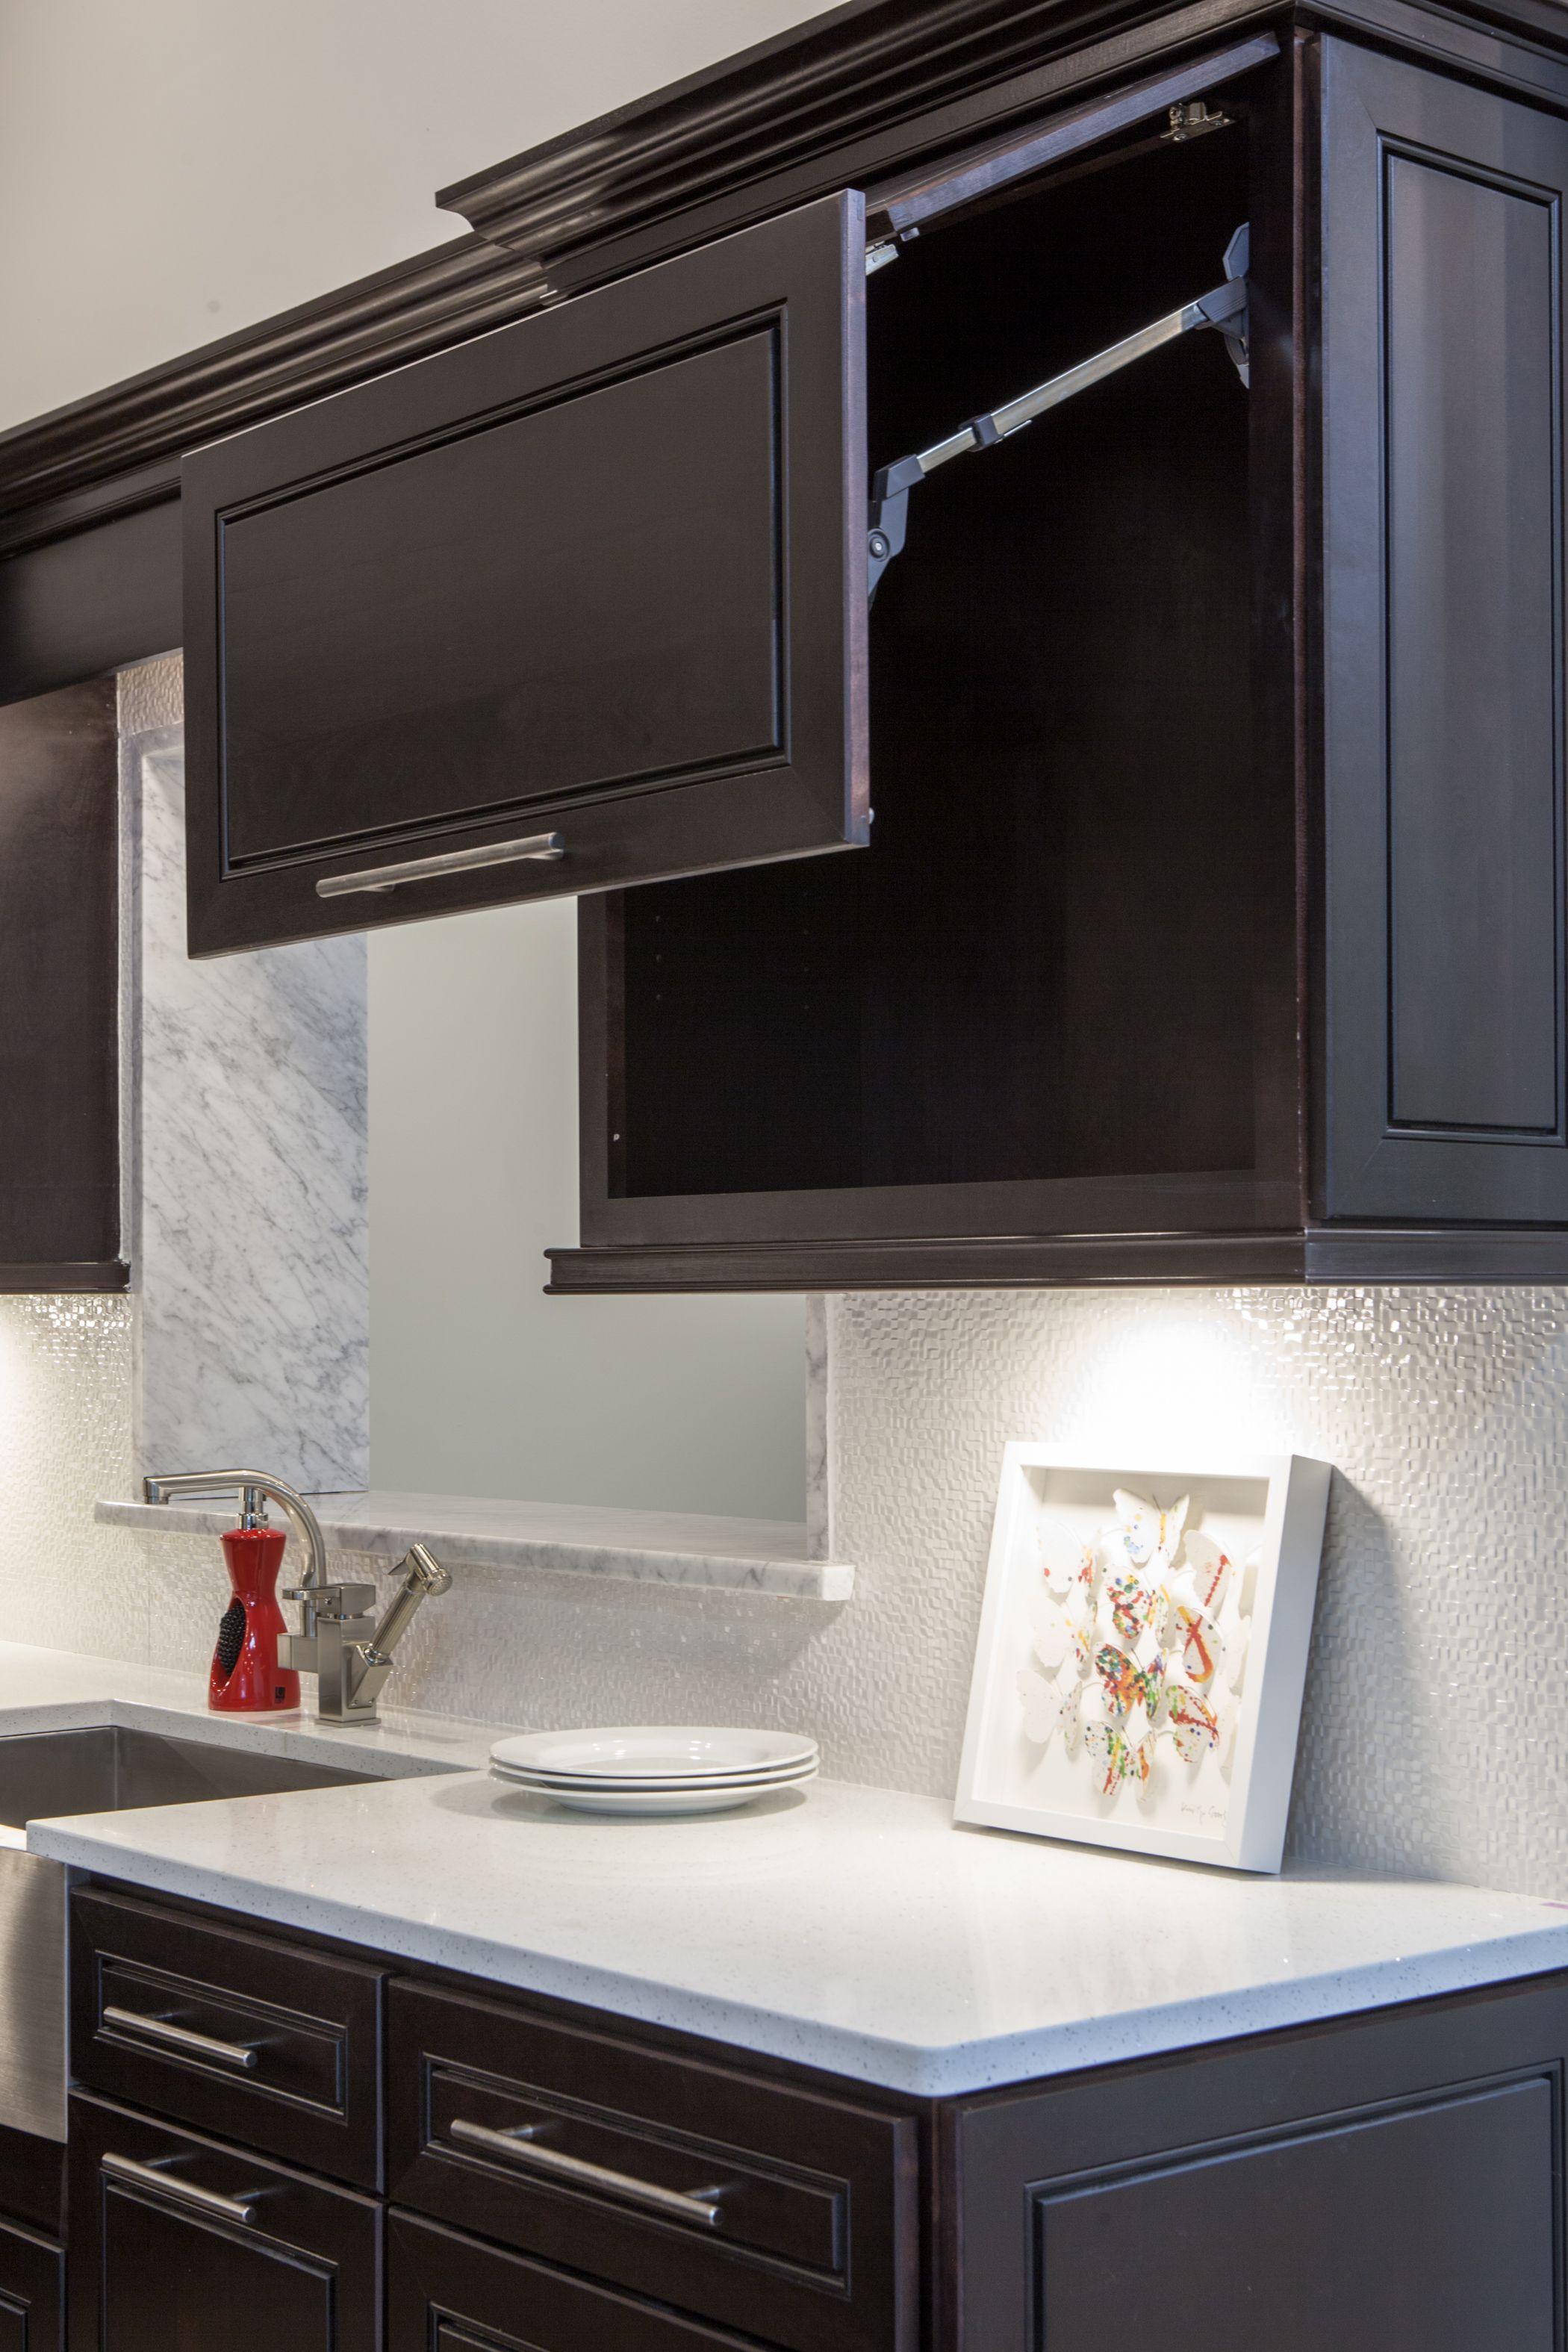 Best J K Espresso Maple Cabinets Style K8 Buy Kitchen 400 x 300